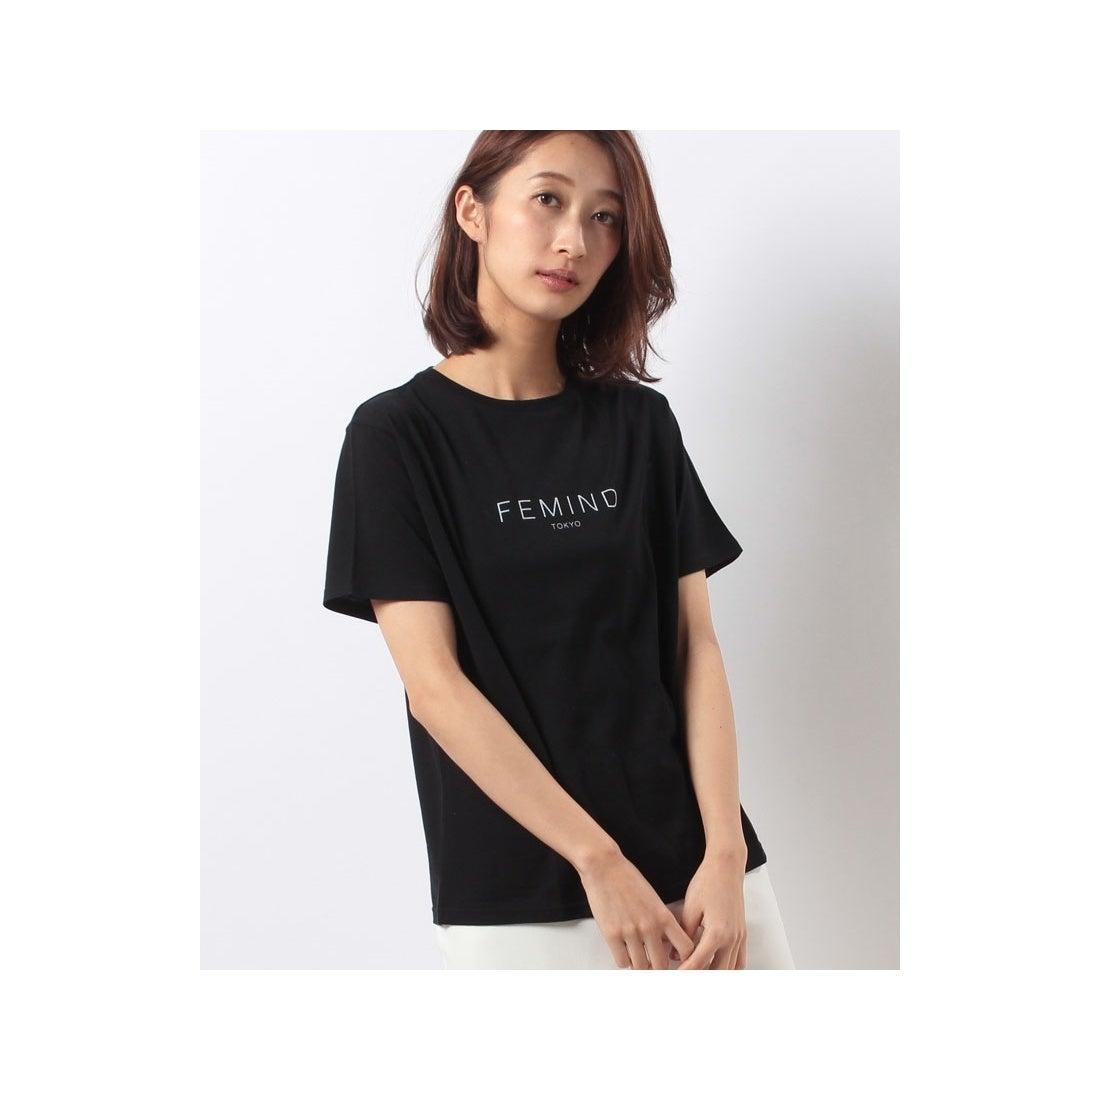 FEMINDTOKYOFEMINDTOKYOTシャツ(BLACK)